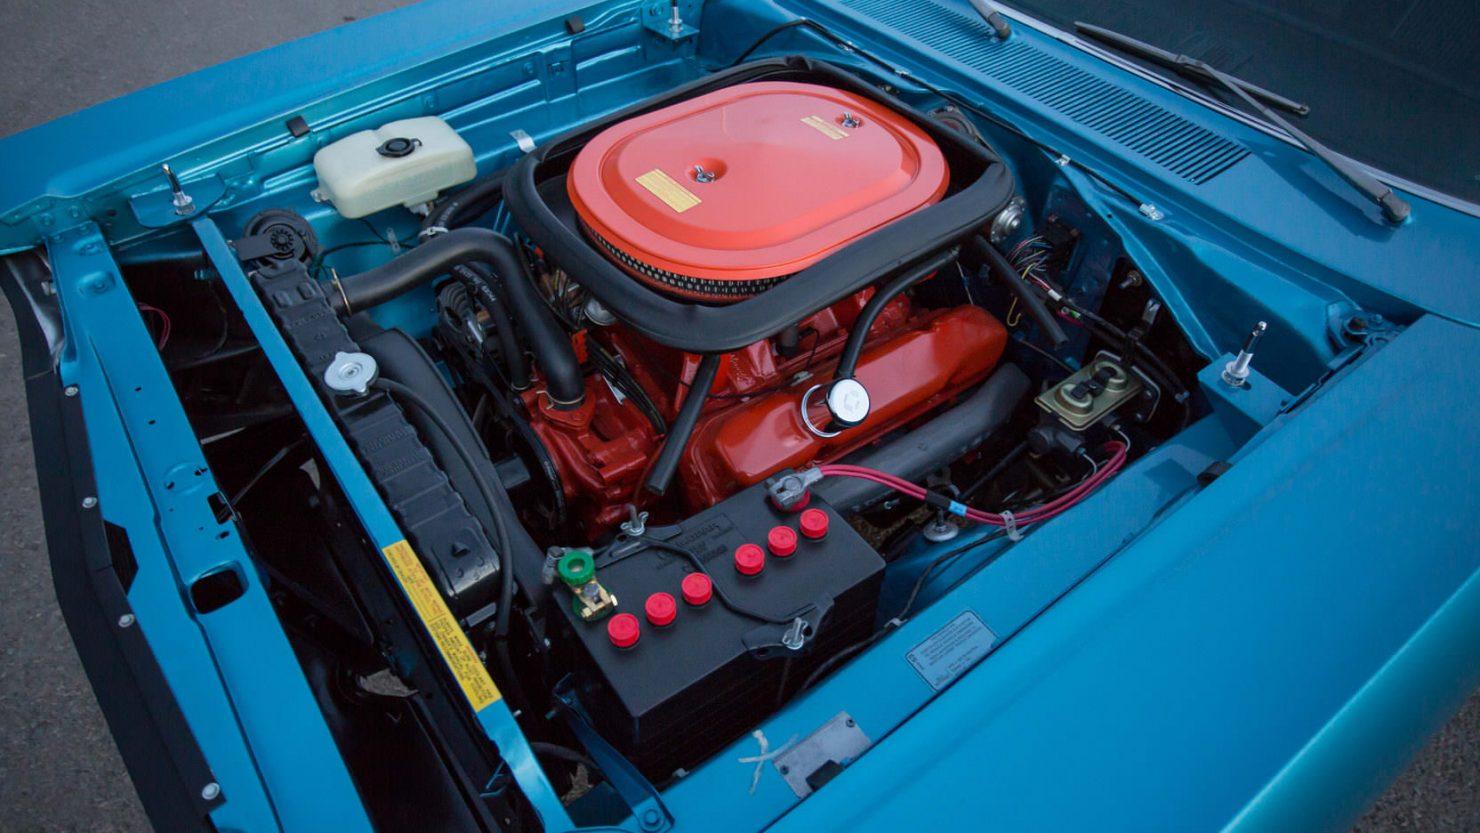 Dodge Super Bee 7 1480x833 - 1969 Dodge Super Bee 440 Six Pack